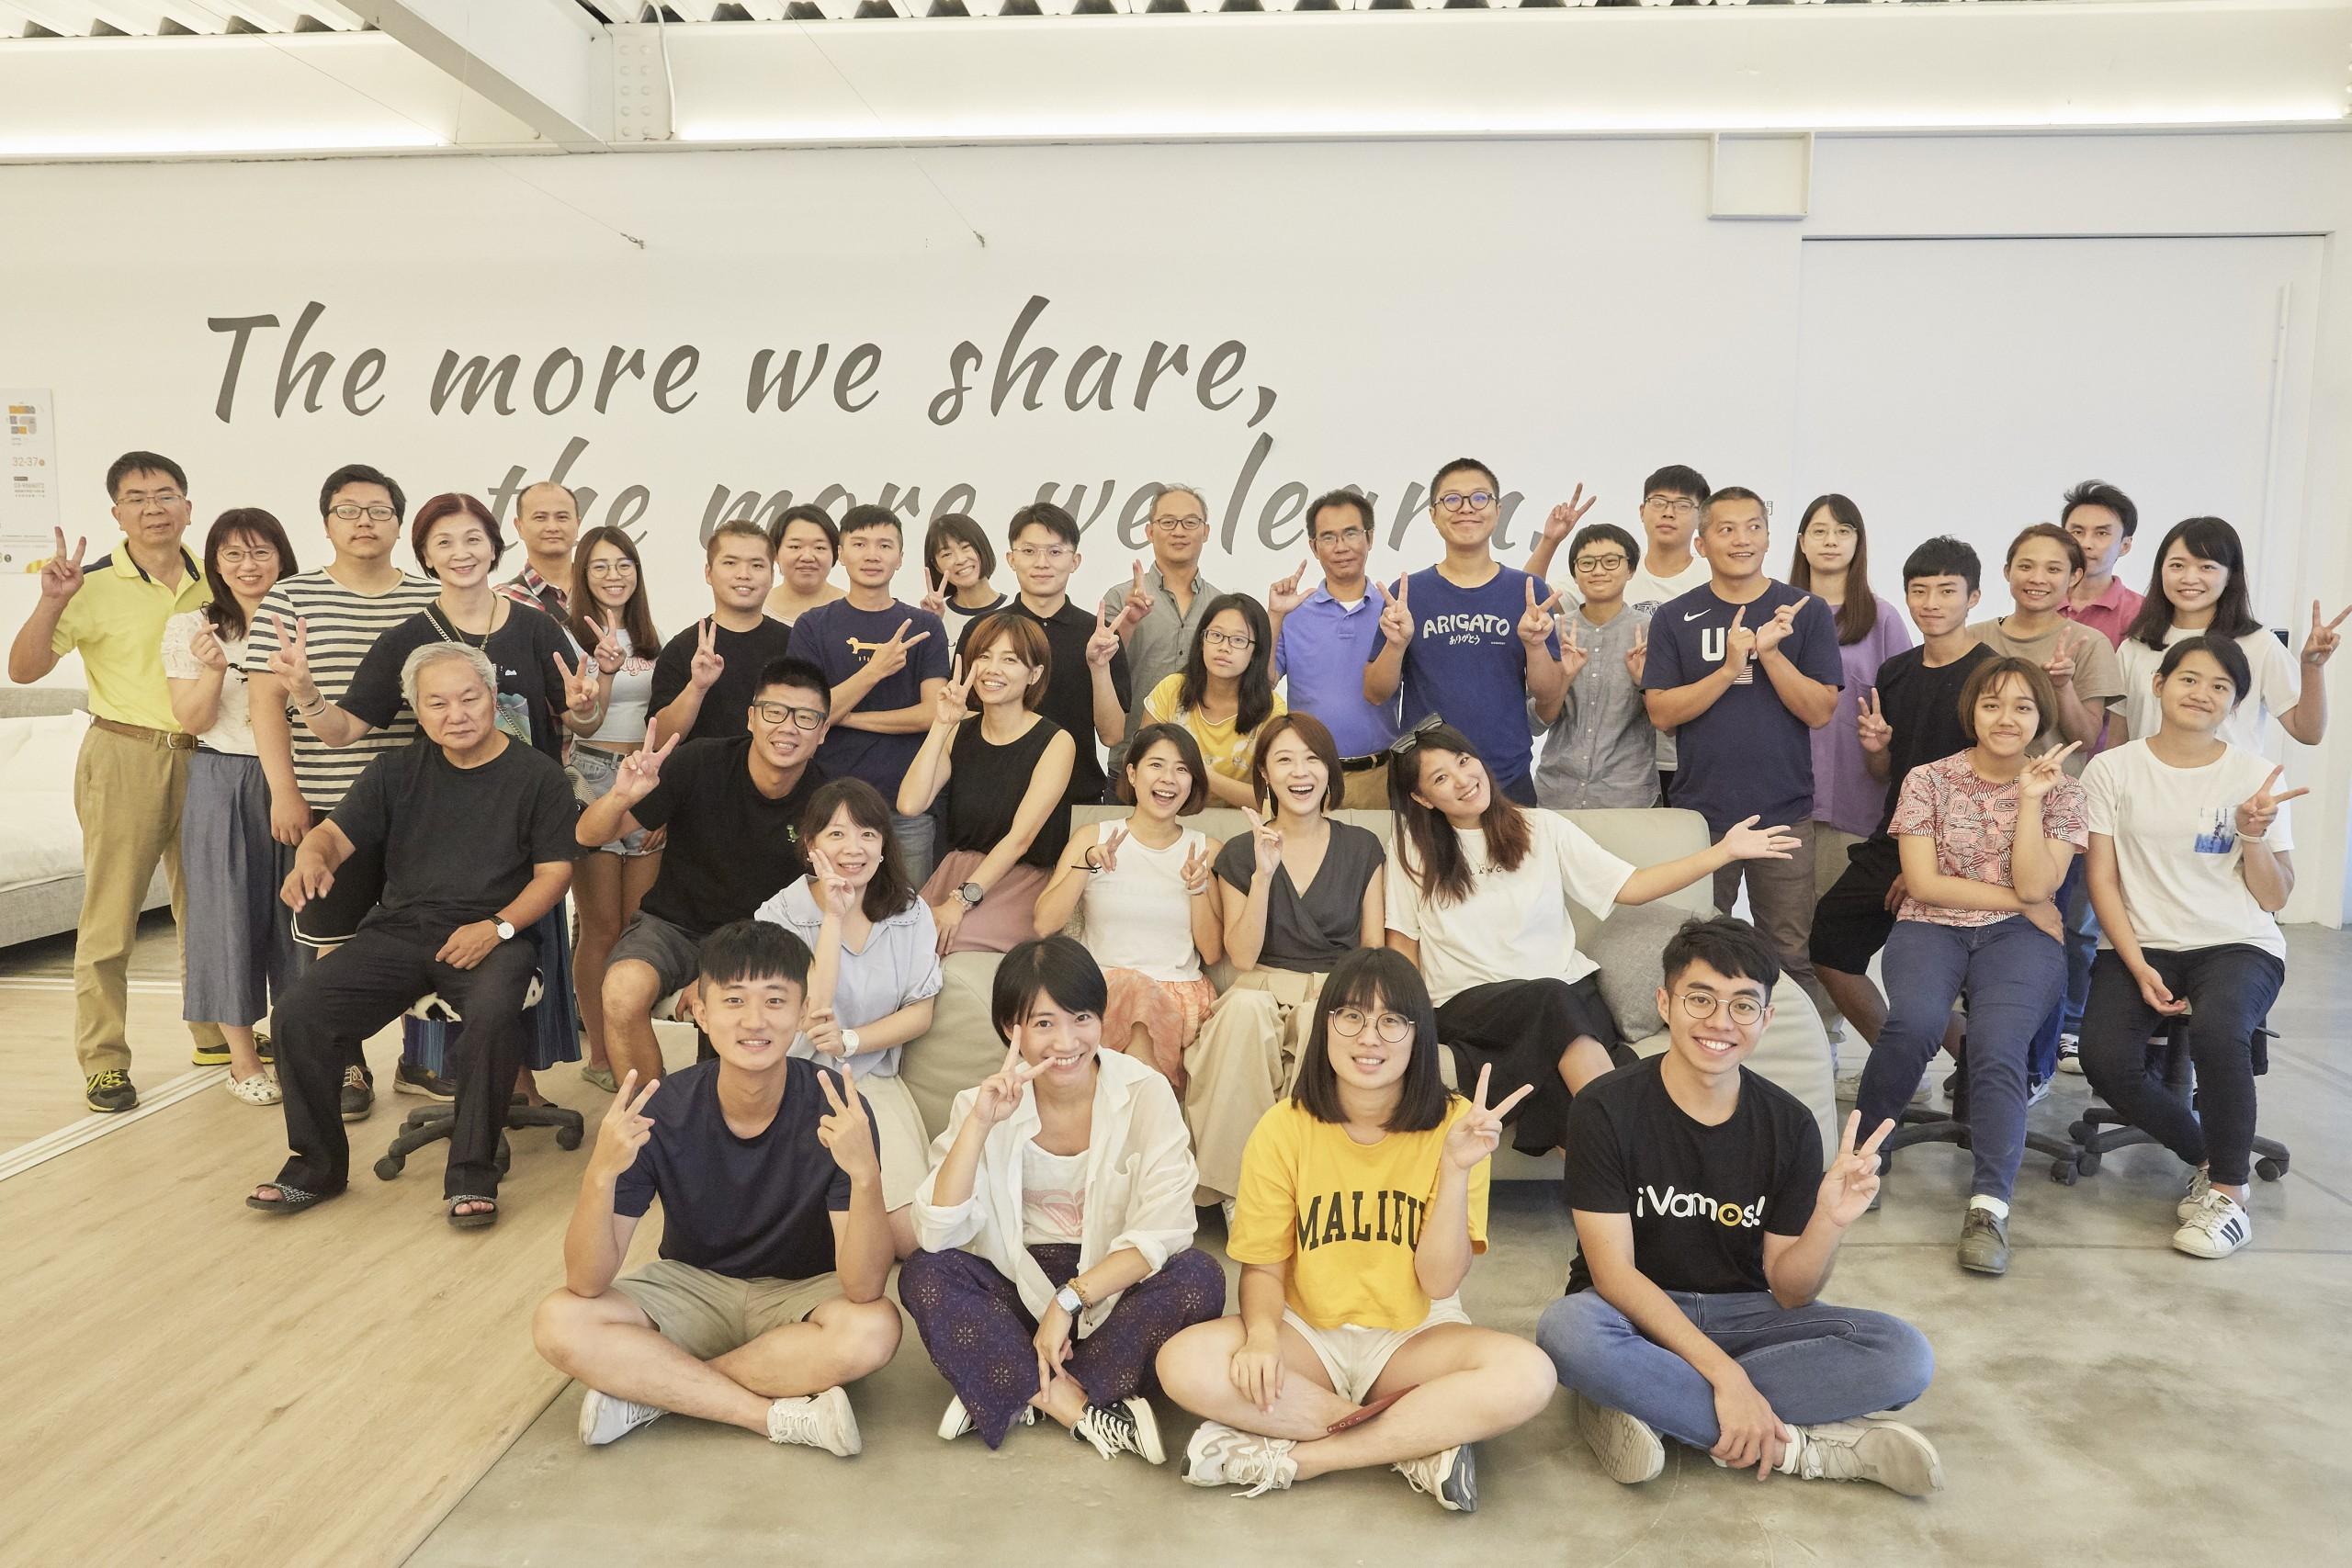 德築-DEZU-workshop-Vamos-Sports-share-1